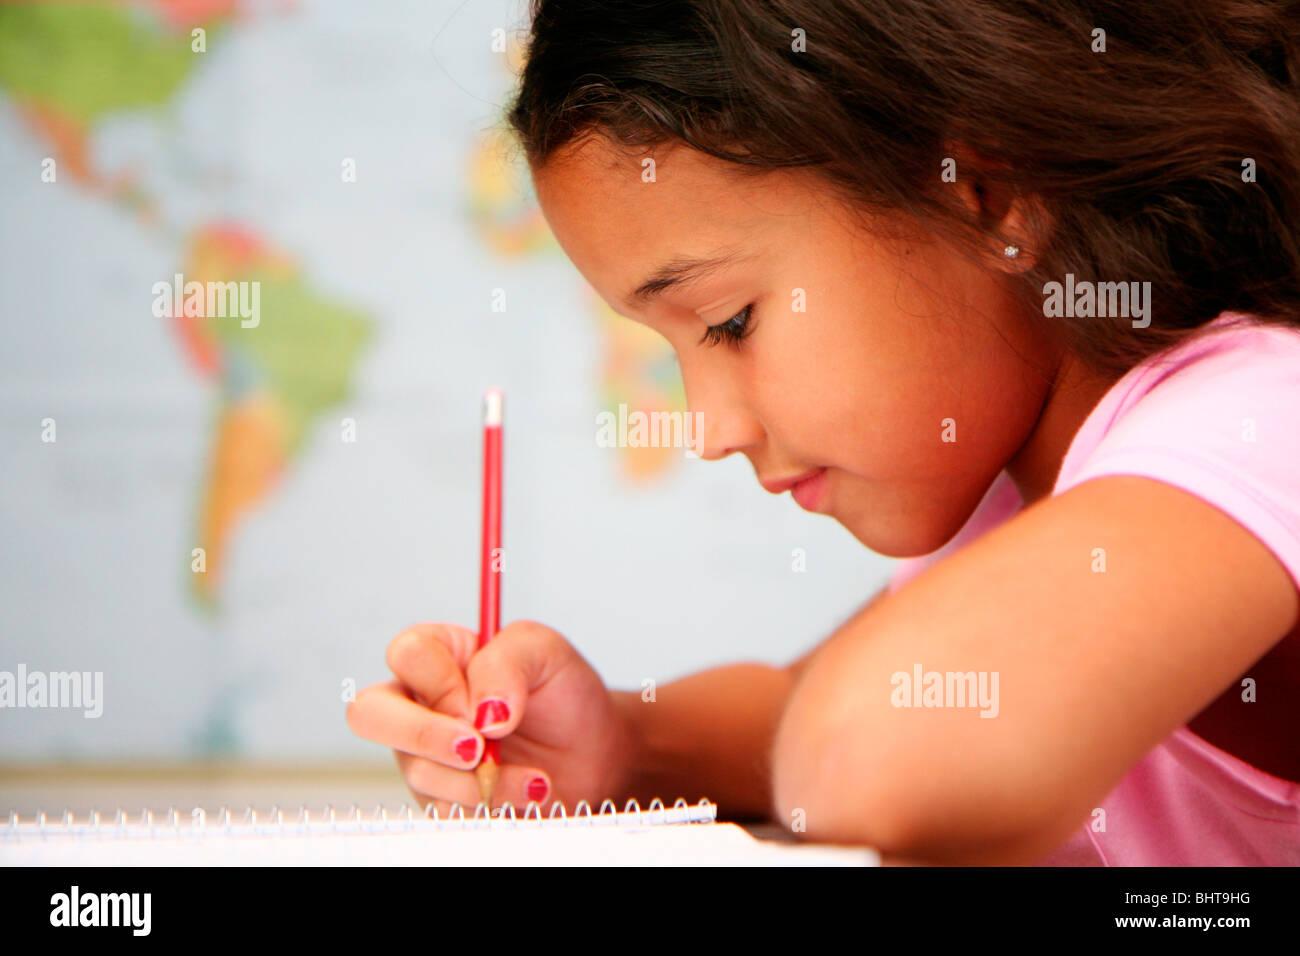 Child at school - Stock Image